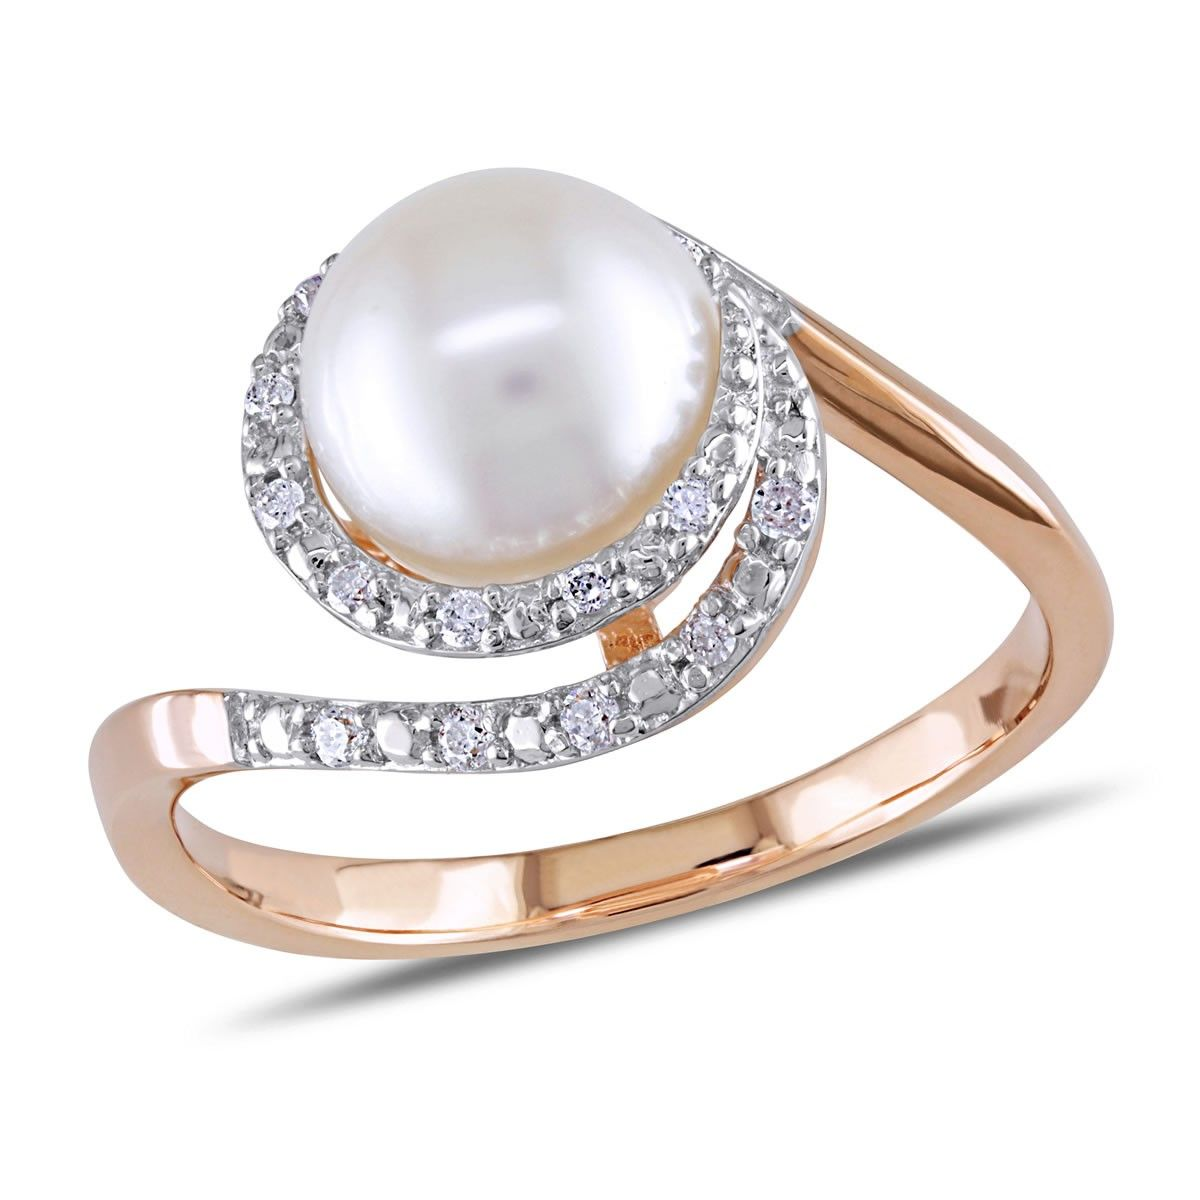 Rose Gold, Diamond & Fresh Water Pearl Ring   Andrews Jewelers